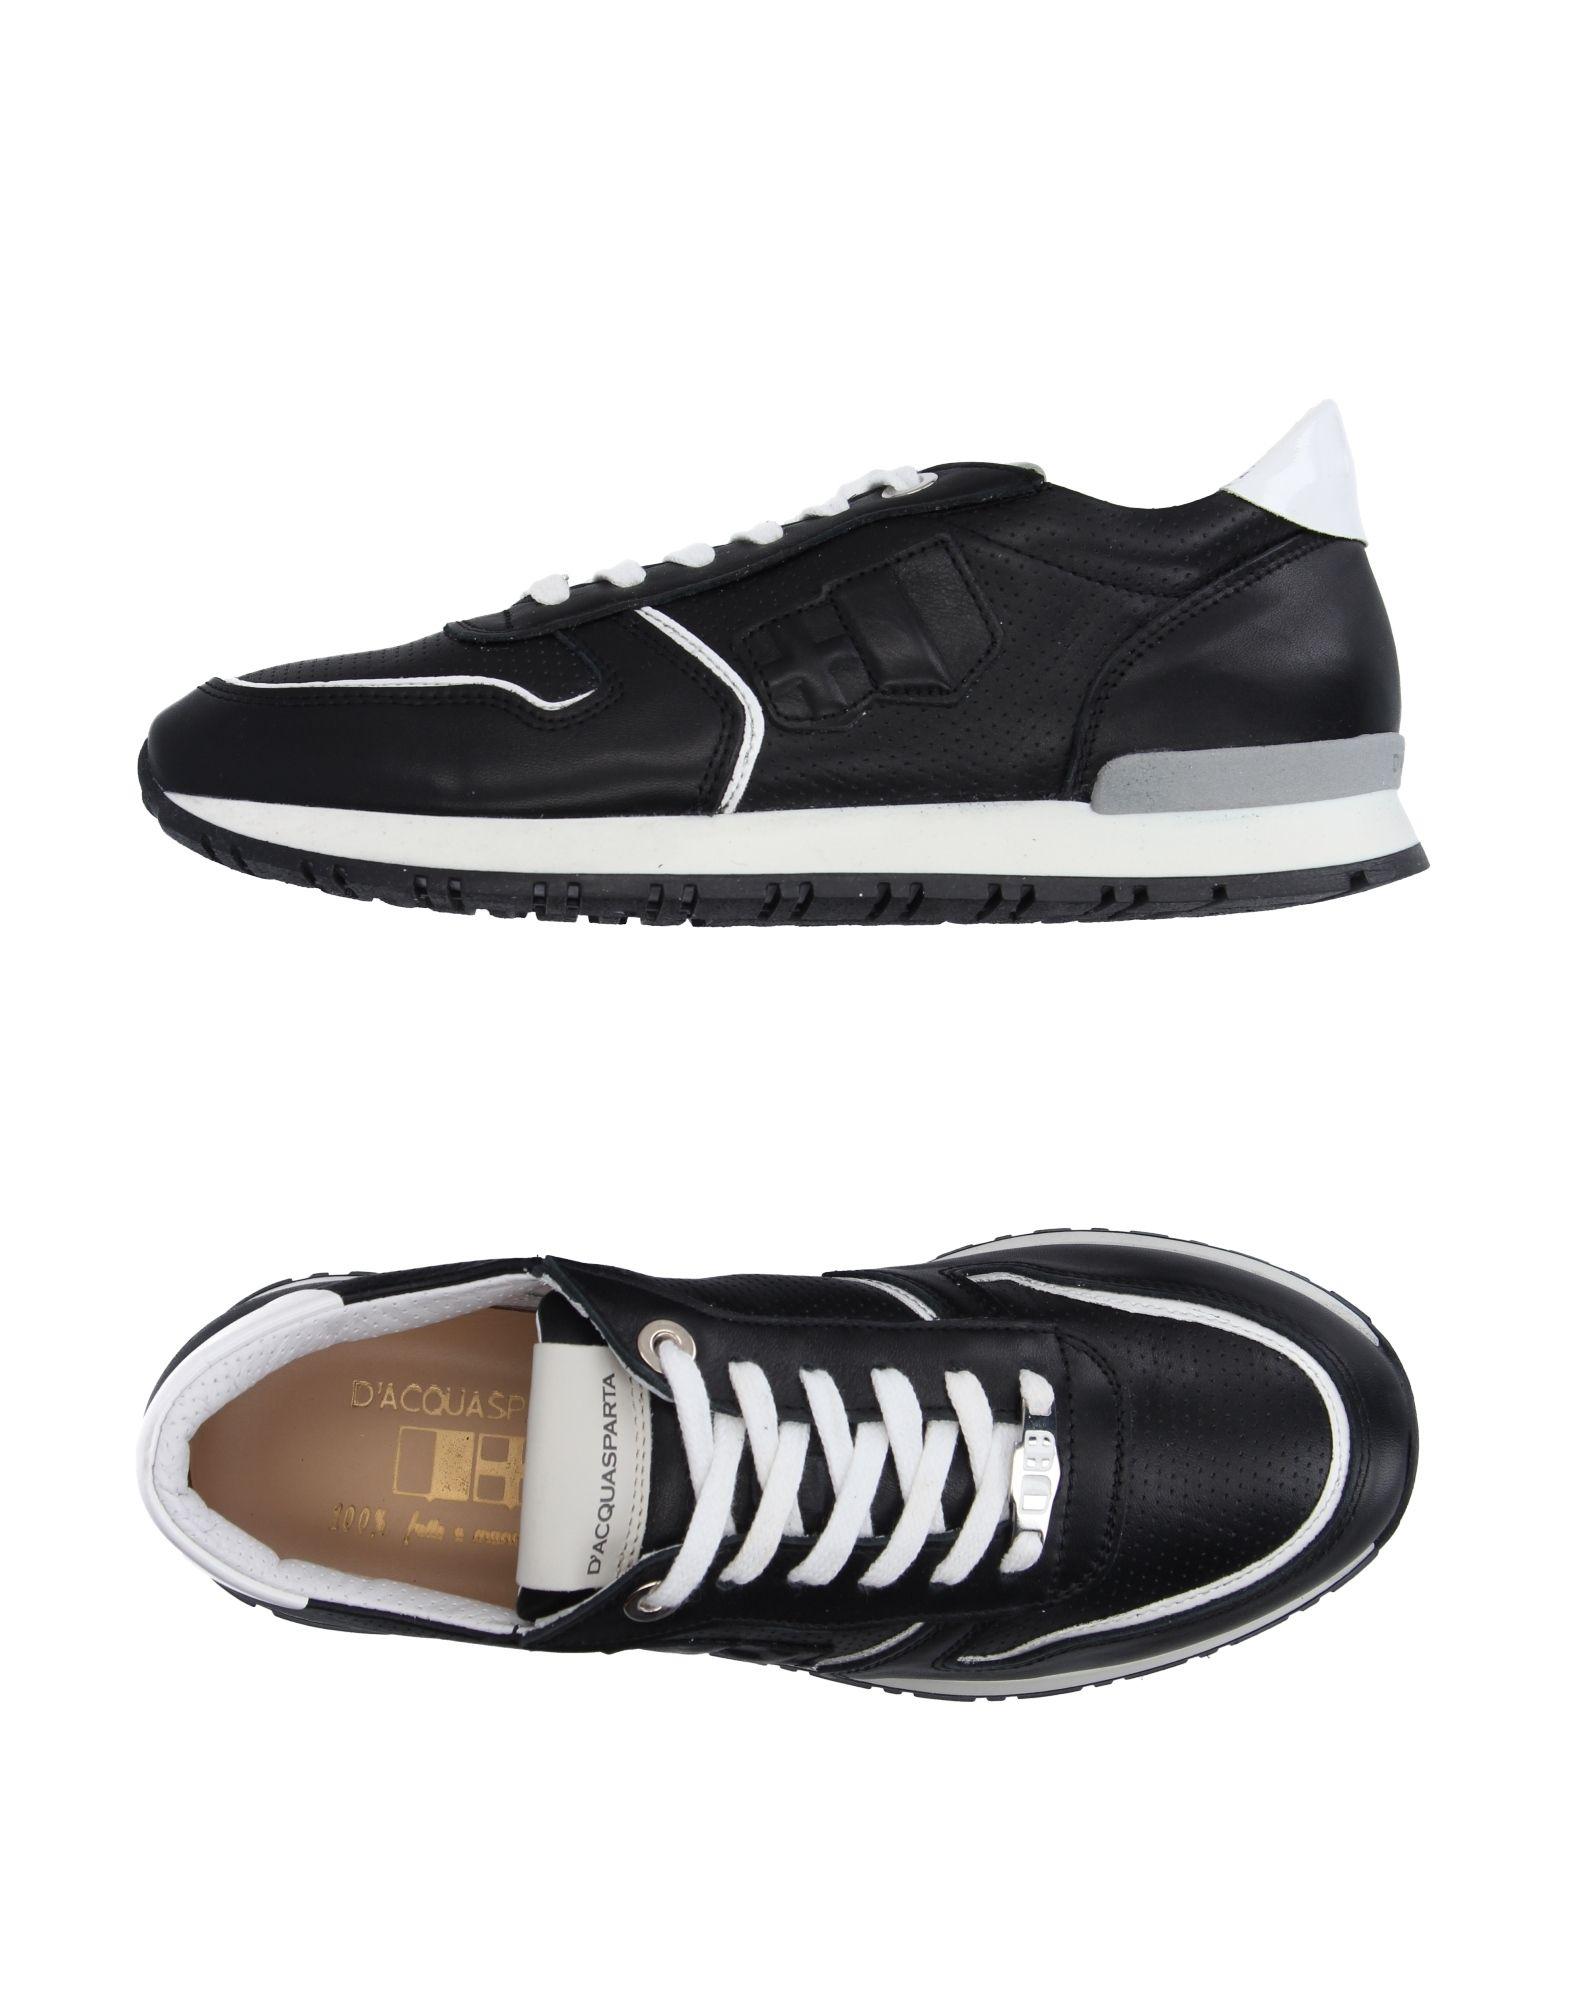 D'Acquasparta Sneakers - Women  D'Acquasparta Sneakers online on  Women Australia - 11171867IC 4c5e1b